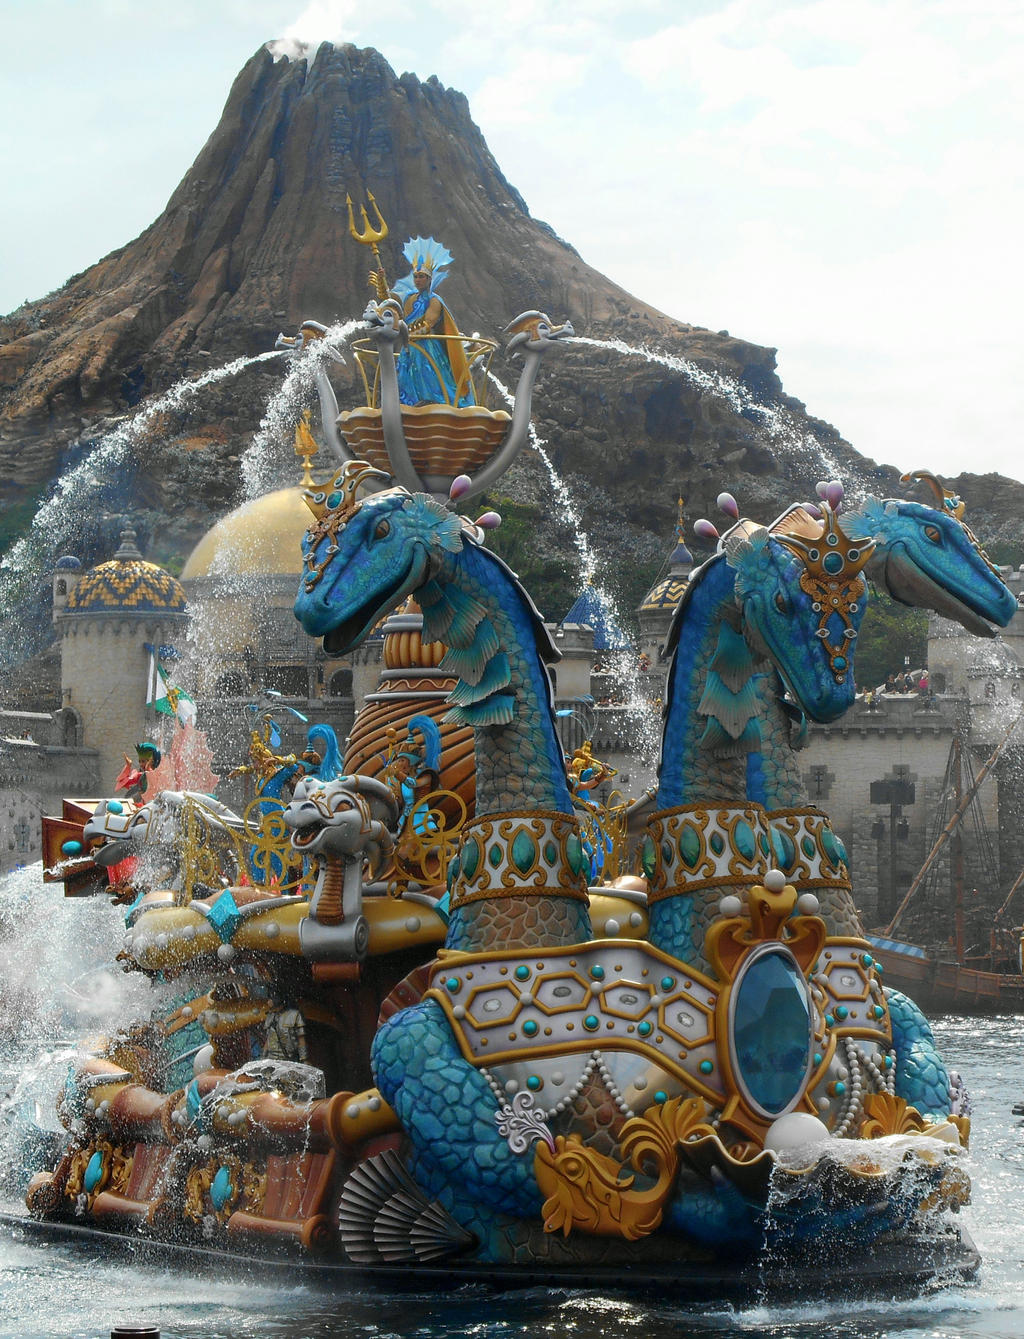 Hydra Float at Tokyo Disney Sea by RubyReminiscence